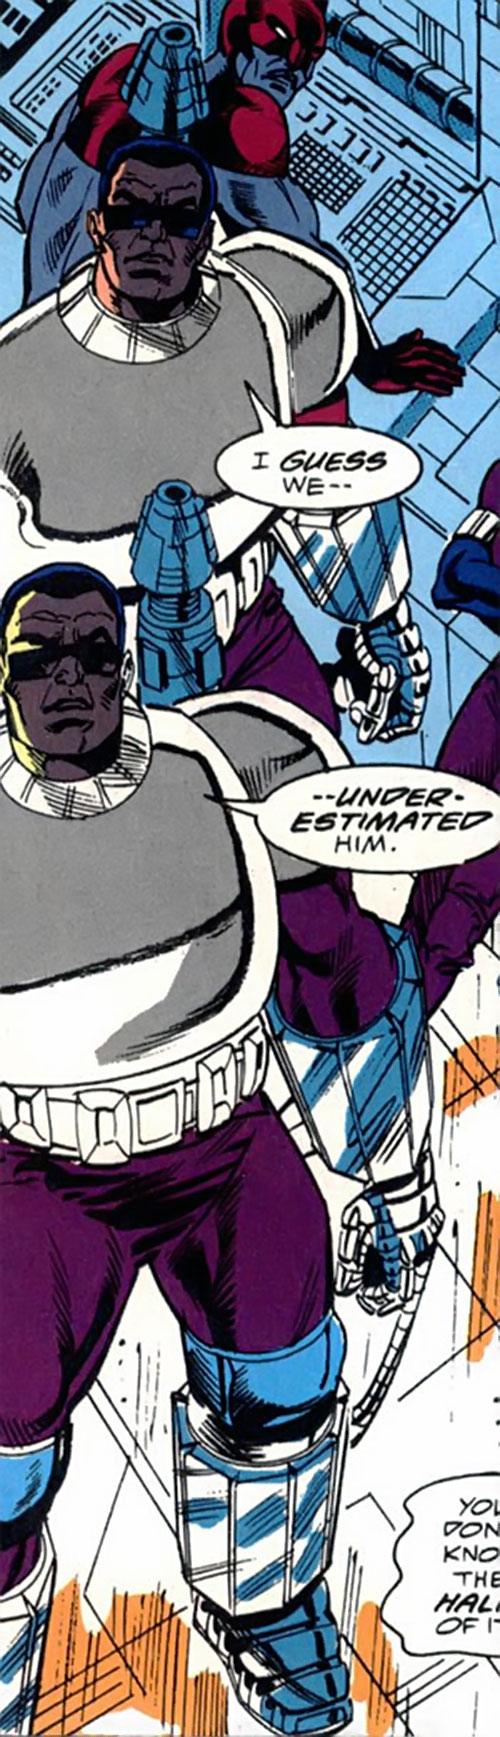 Assault & Battery (Nick Fury enemies) (Marvel Comics)